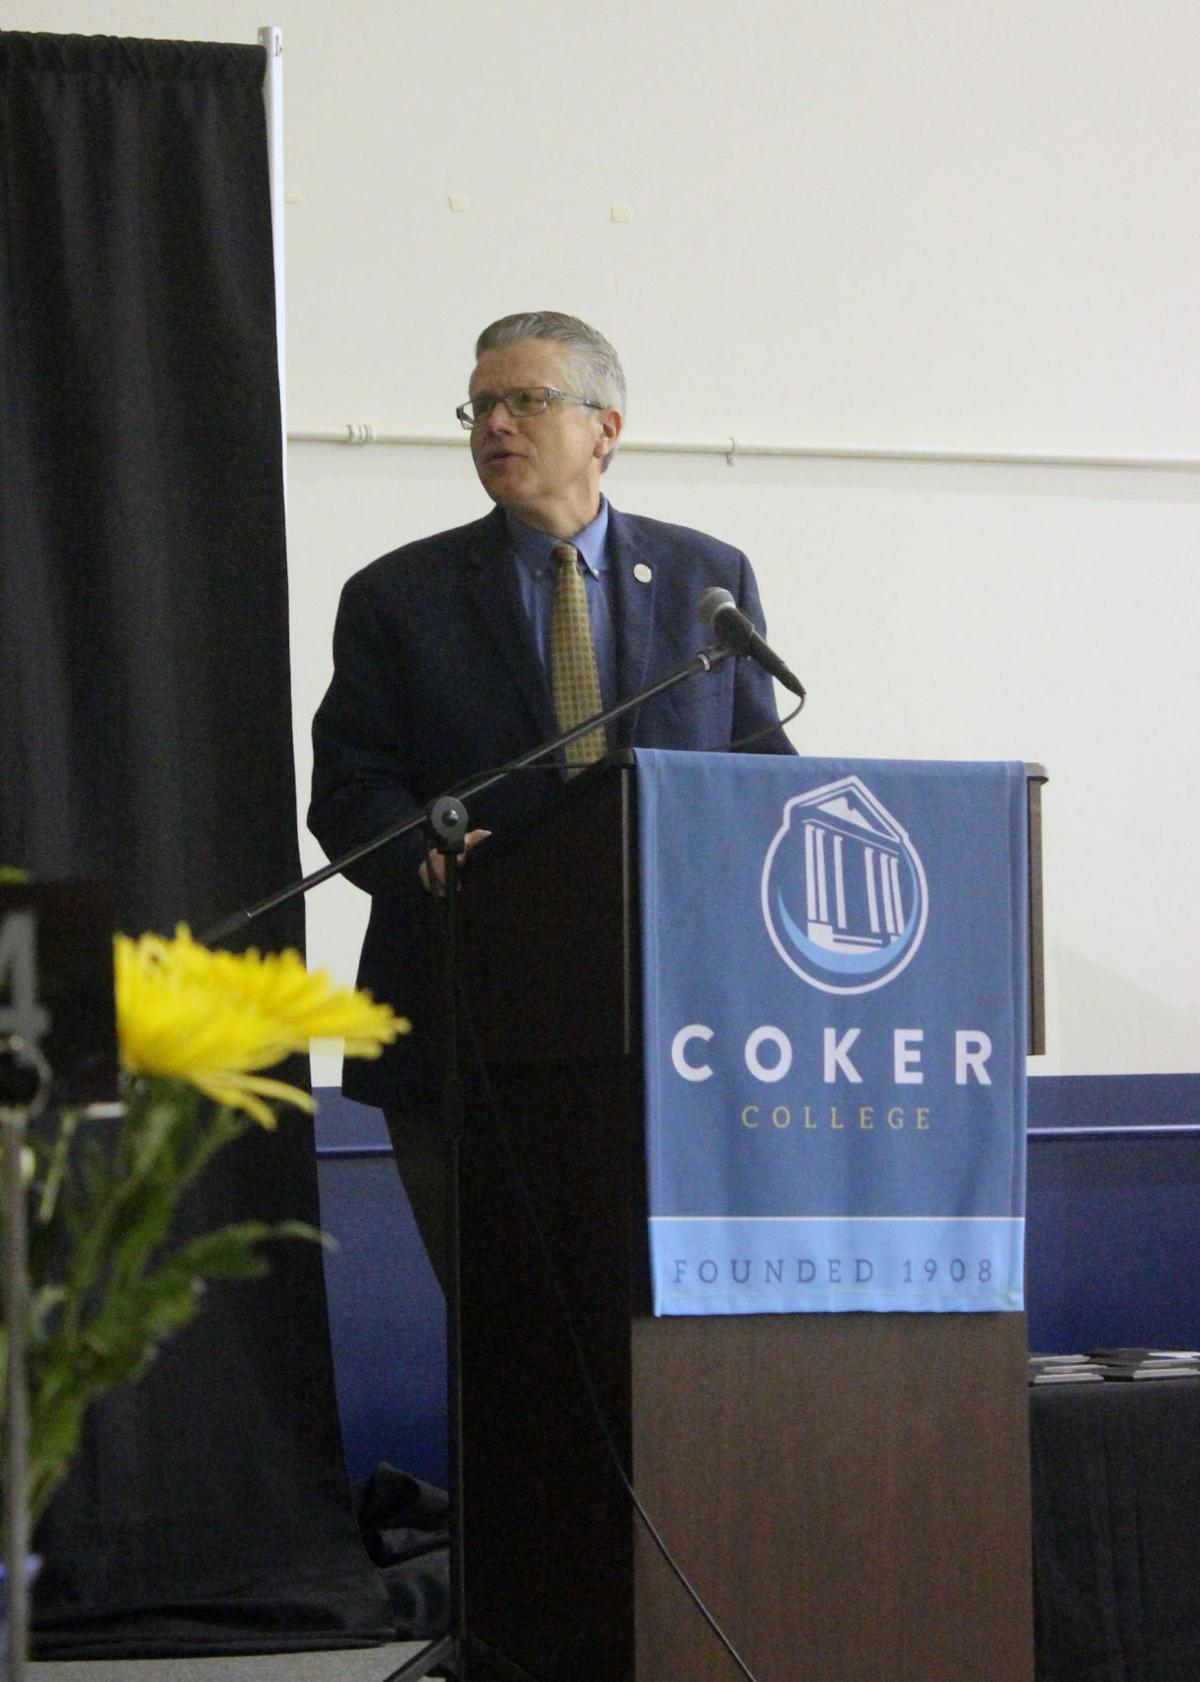 Coker Hall of Fame